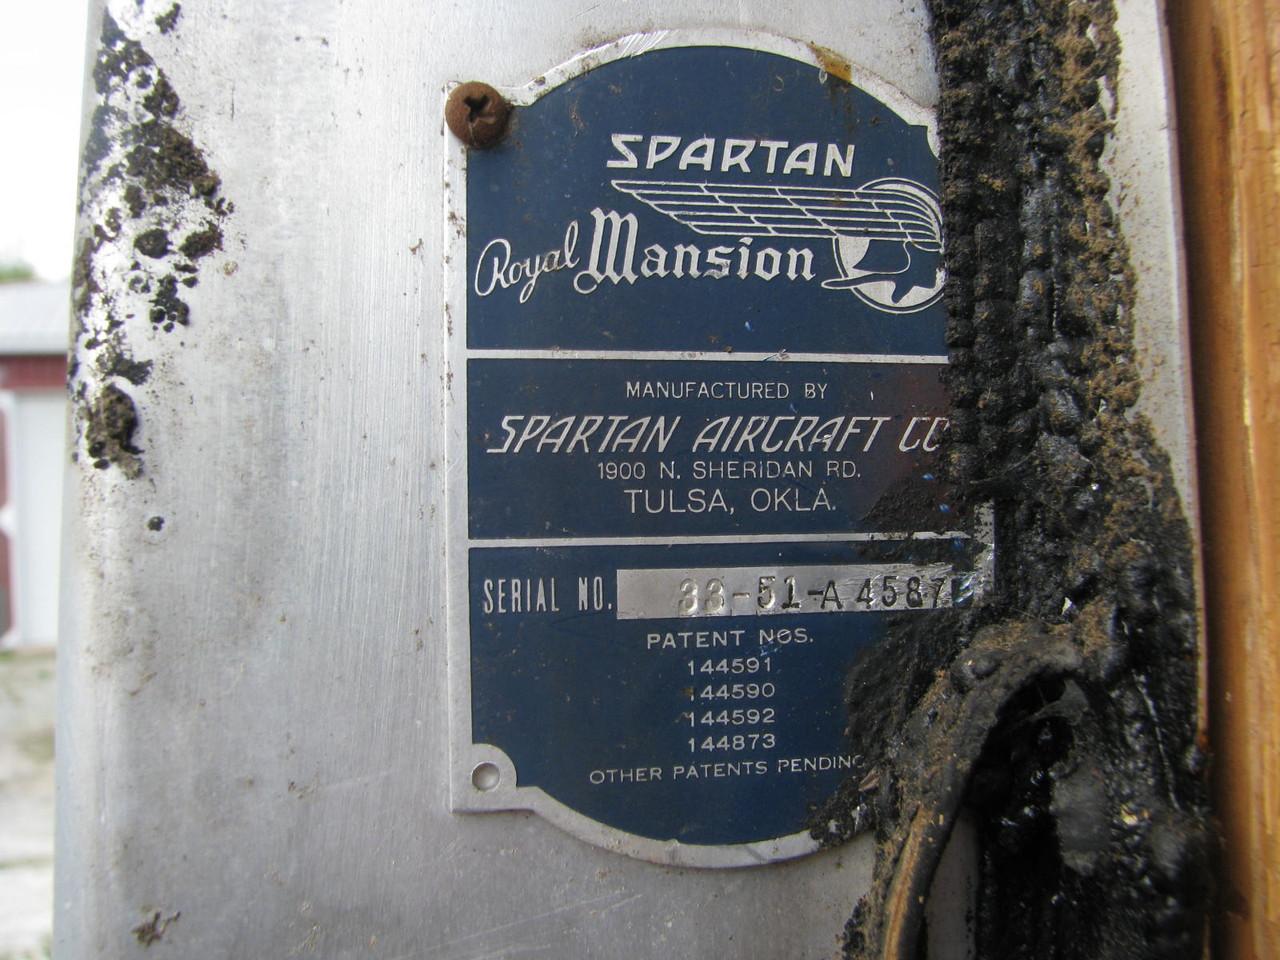 1951 Spartan 33' Royal Mansion #A4587